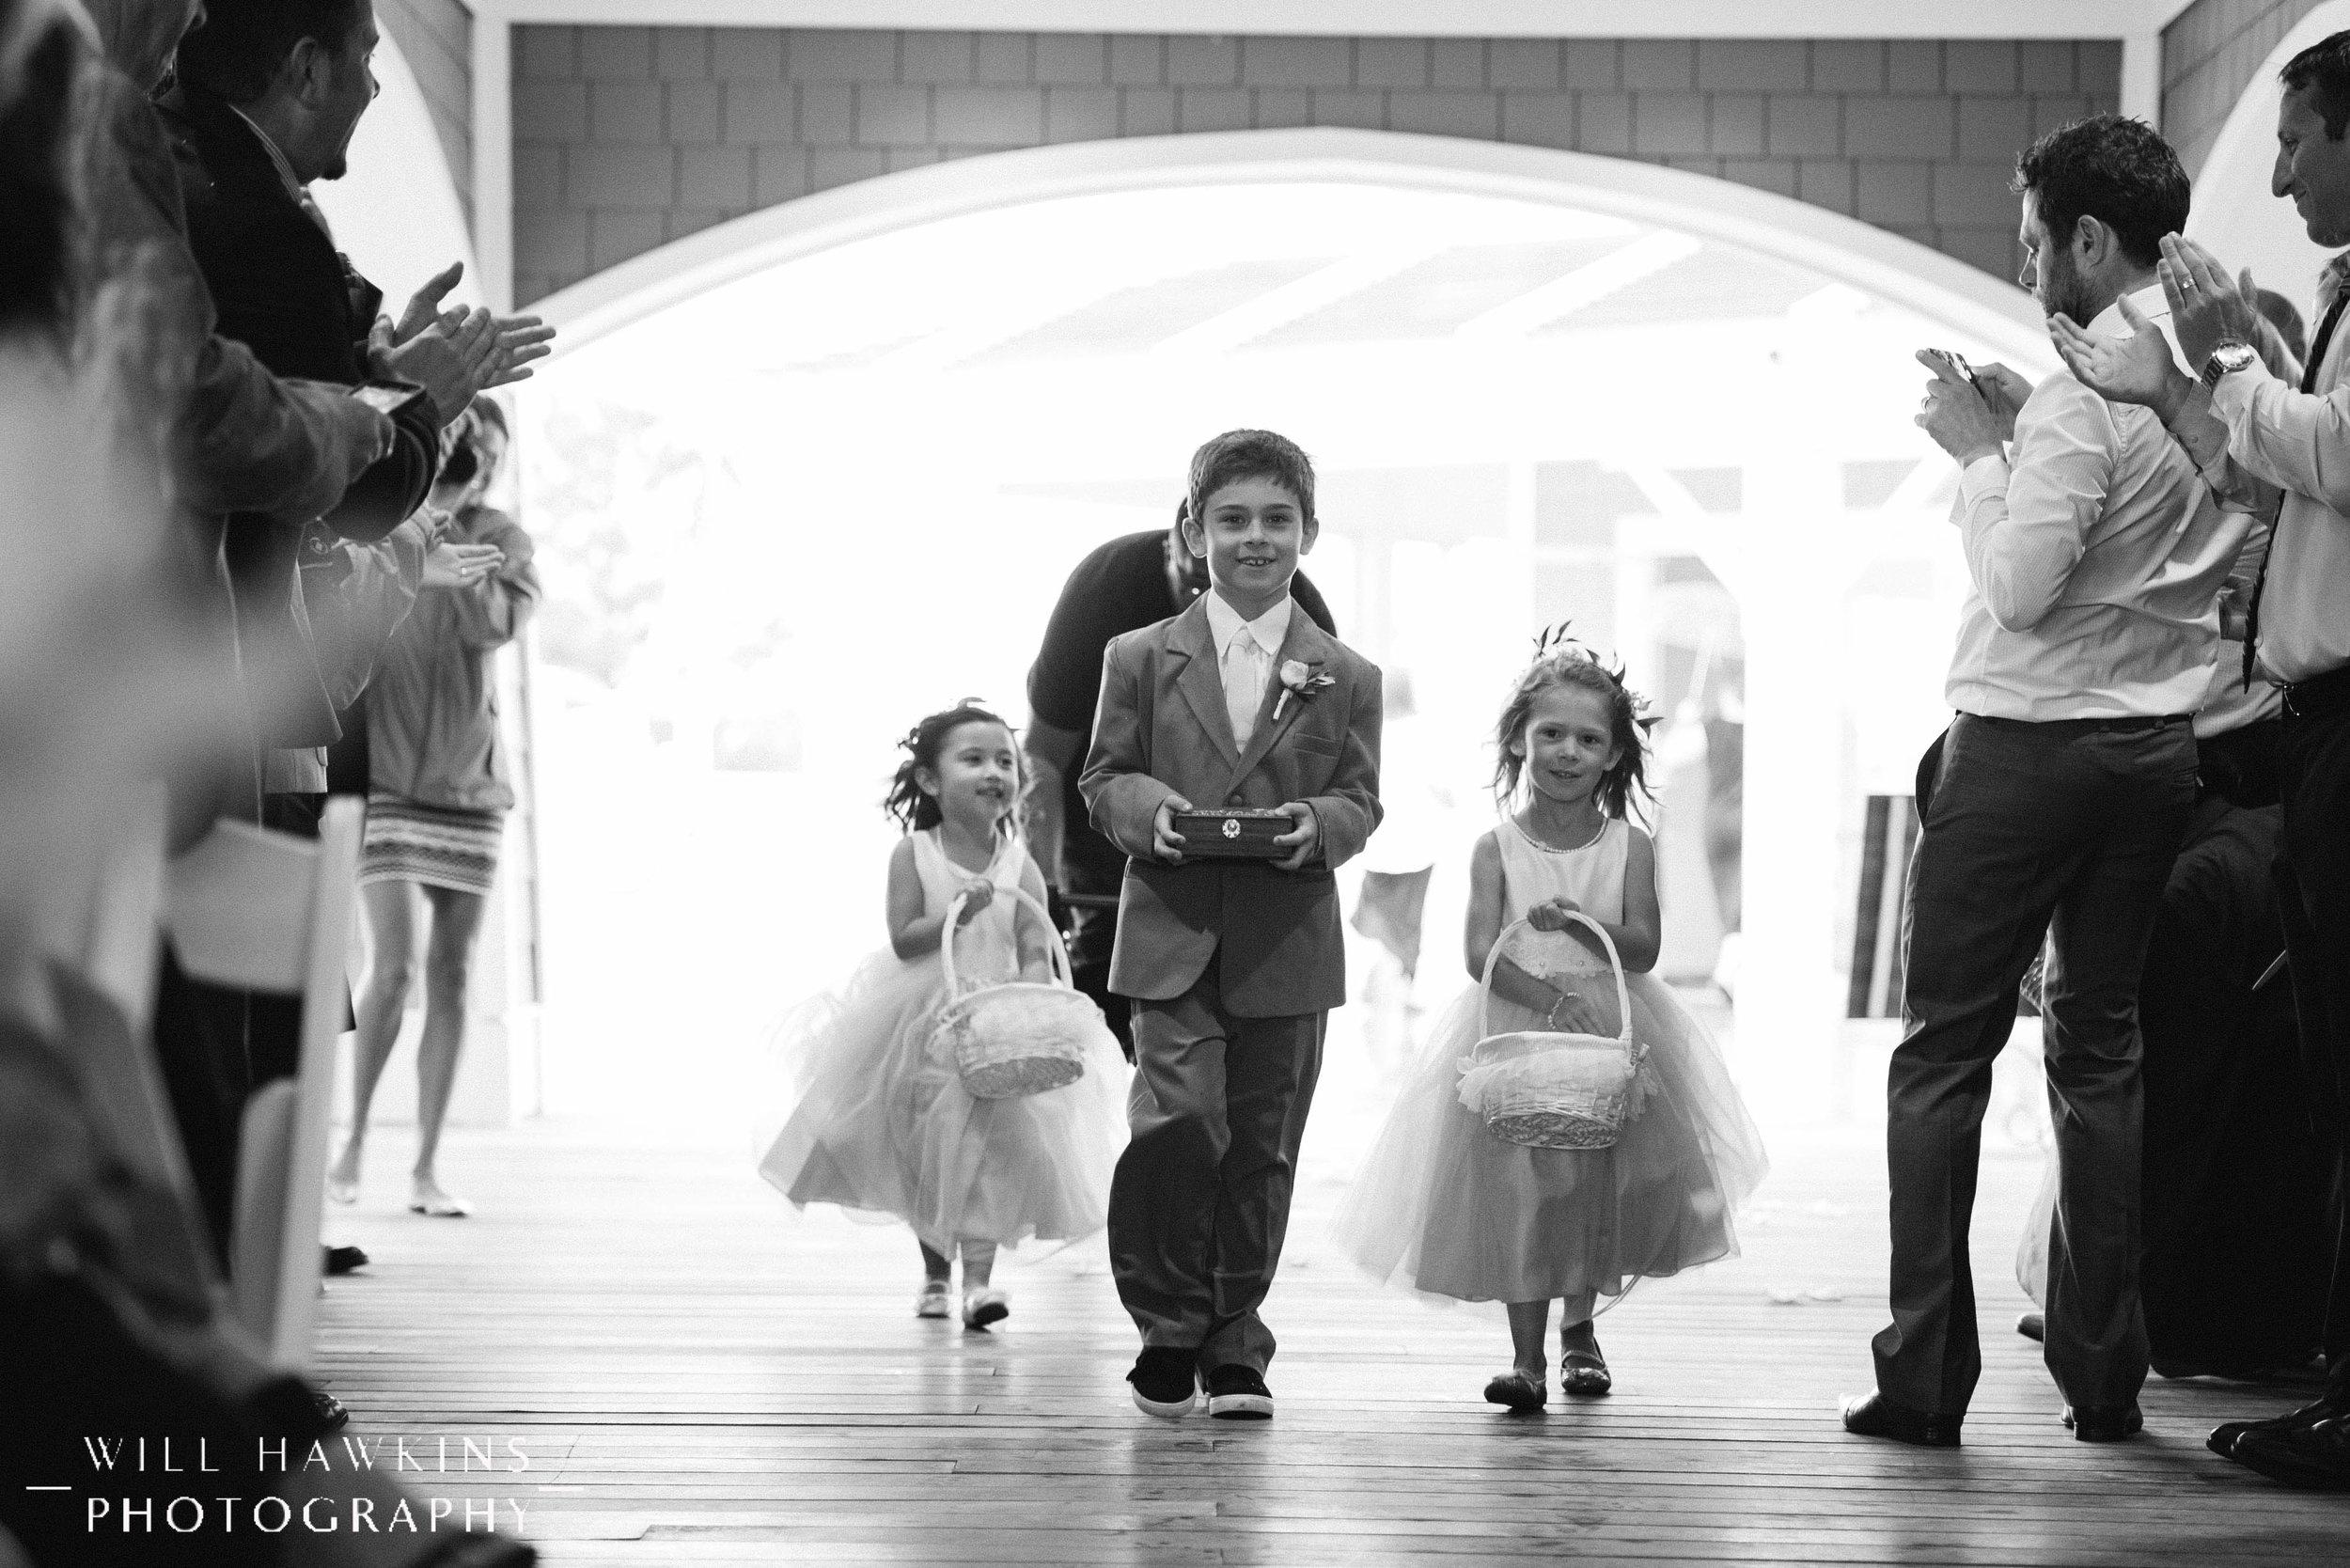 Will Hawkins Photography, Virginia Wedding Photographer, Virginia Beach Wedding Photographer, Destination Wedding Photographer (6 of 24).jpg